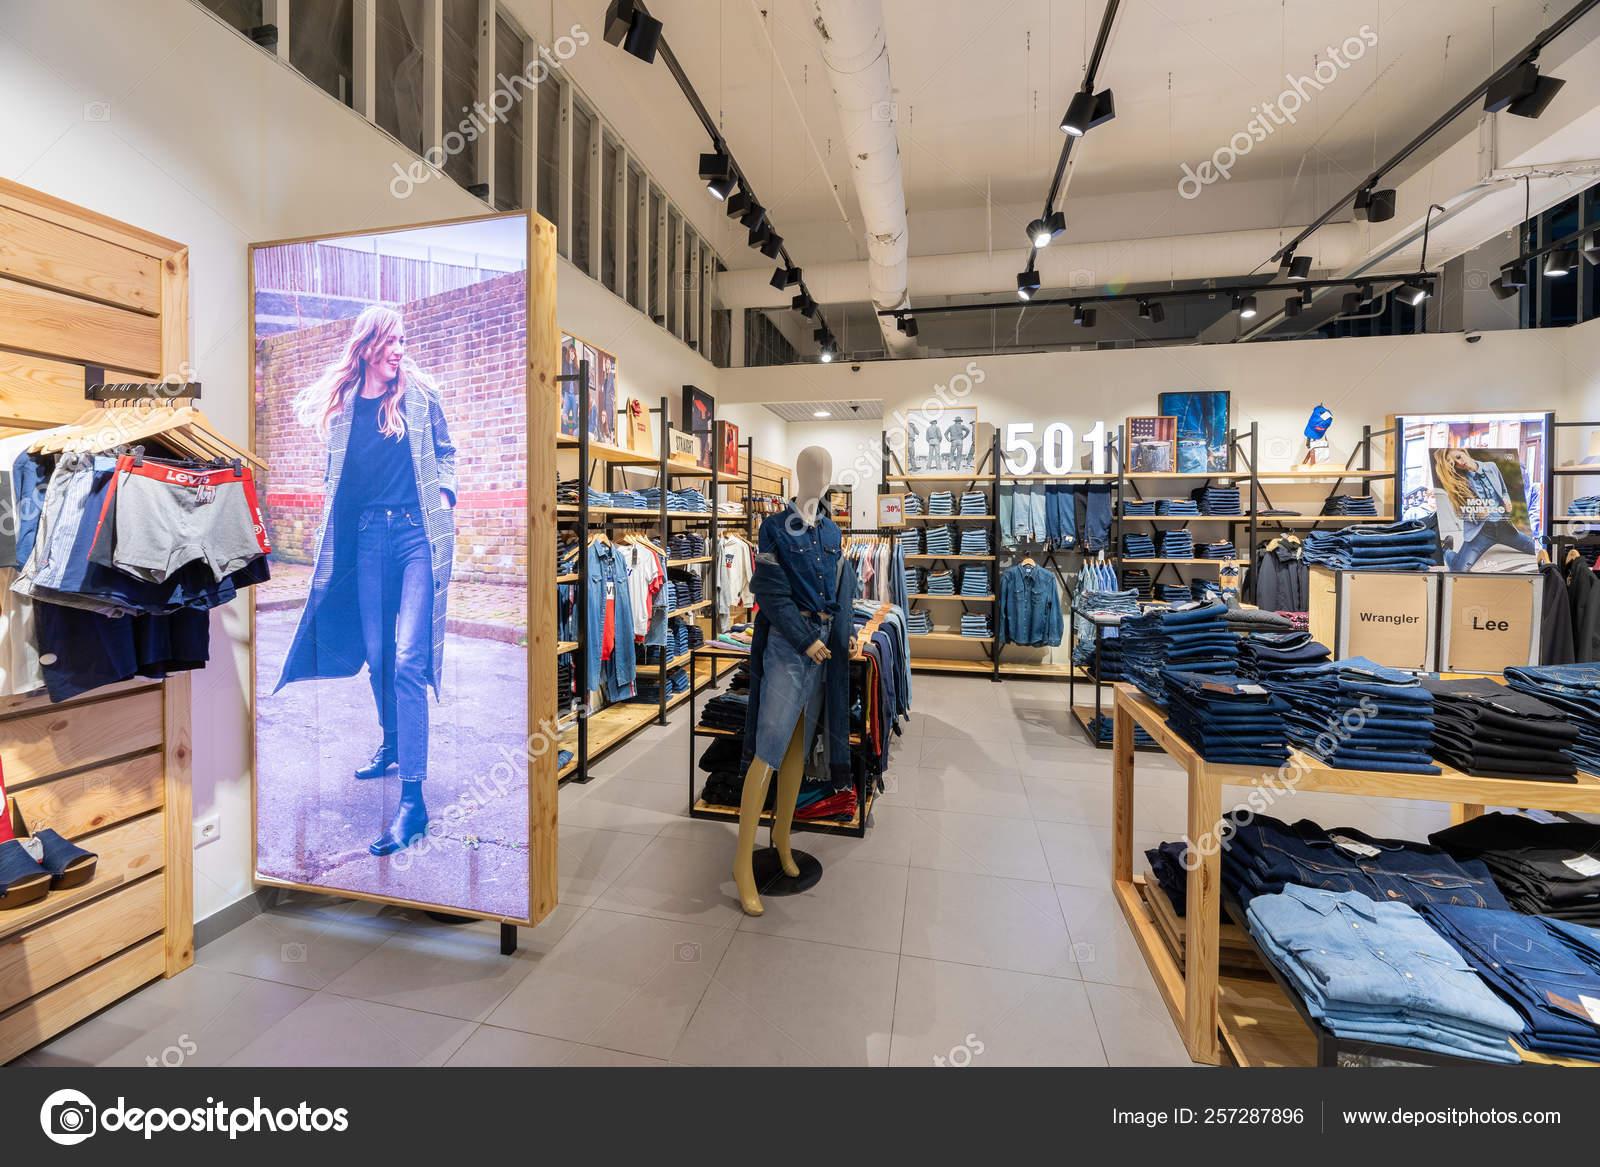 a basso prezzo 5c3b3 3b145 Minsk, Belarus - March 26, 2018: interior shot of Levis shop ...